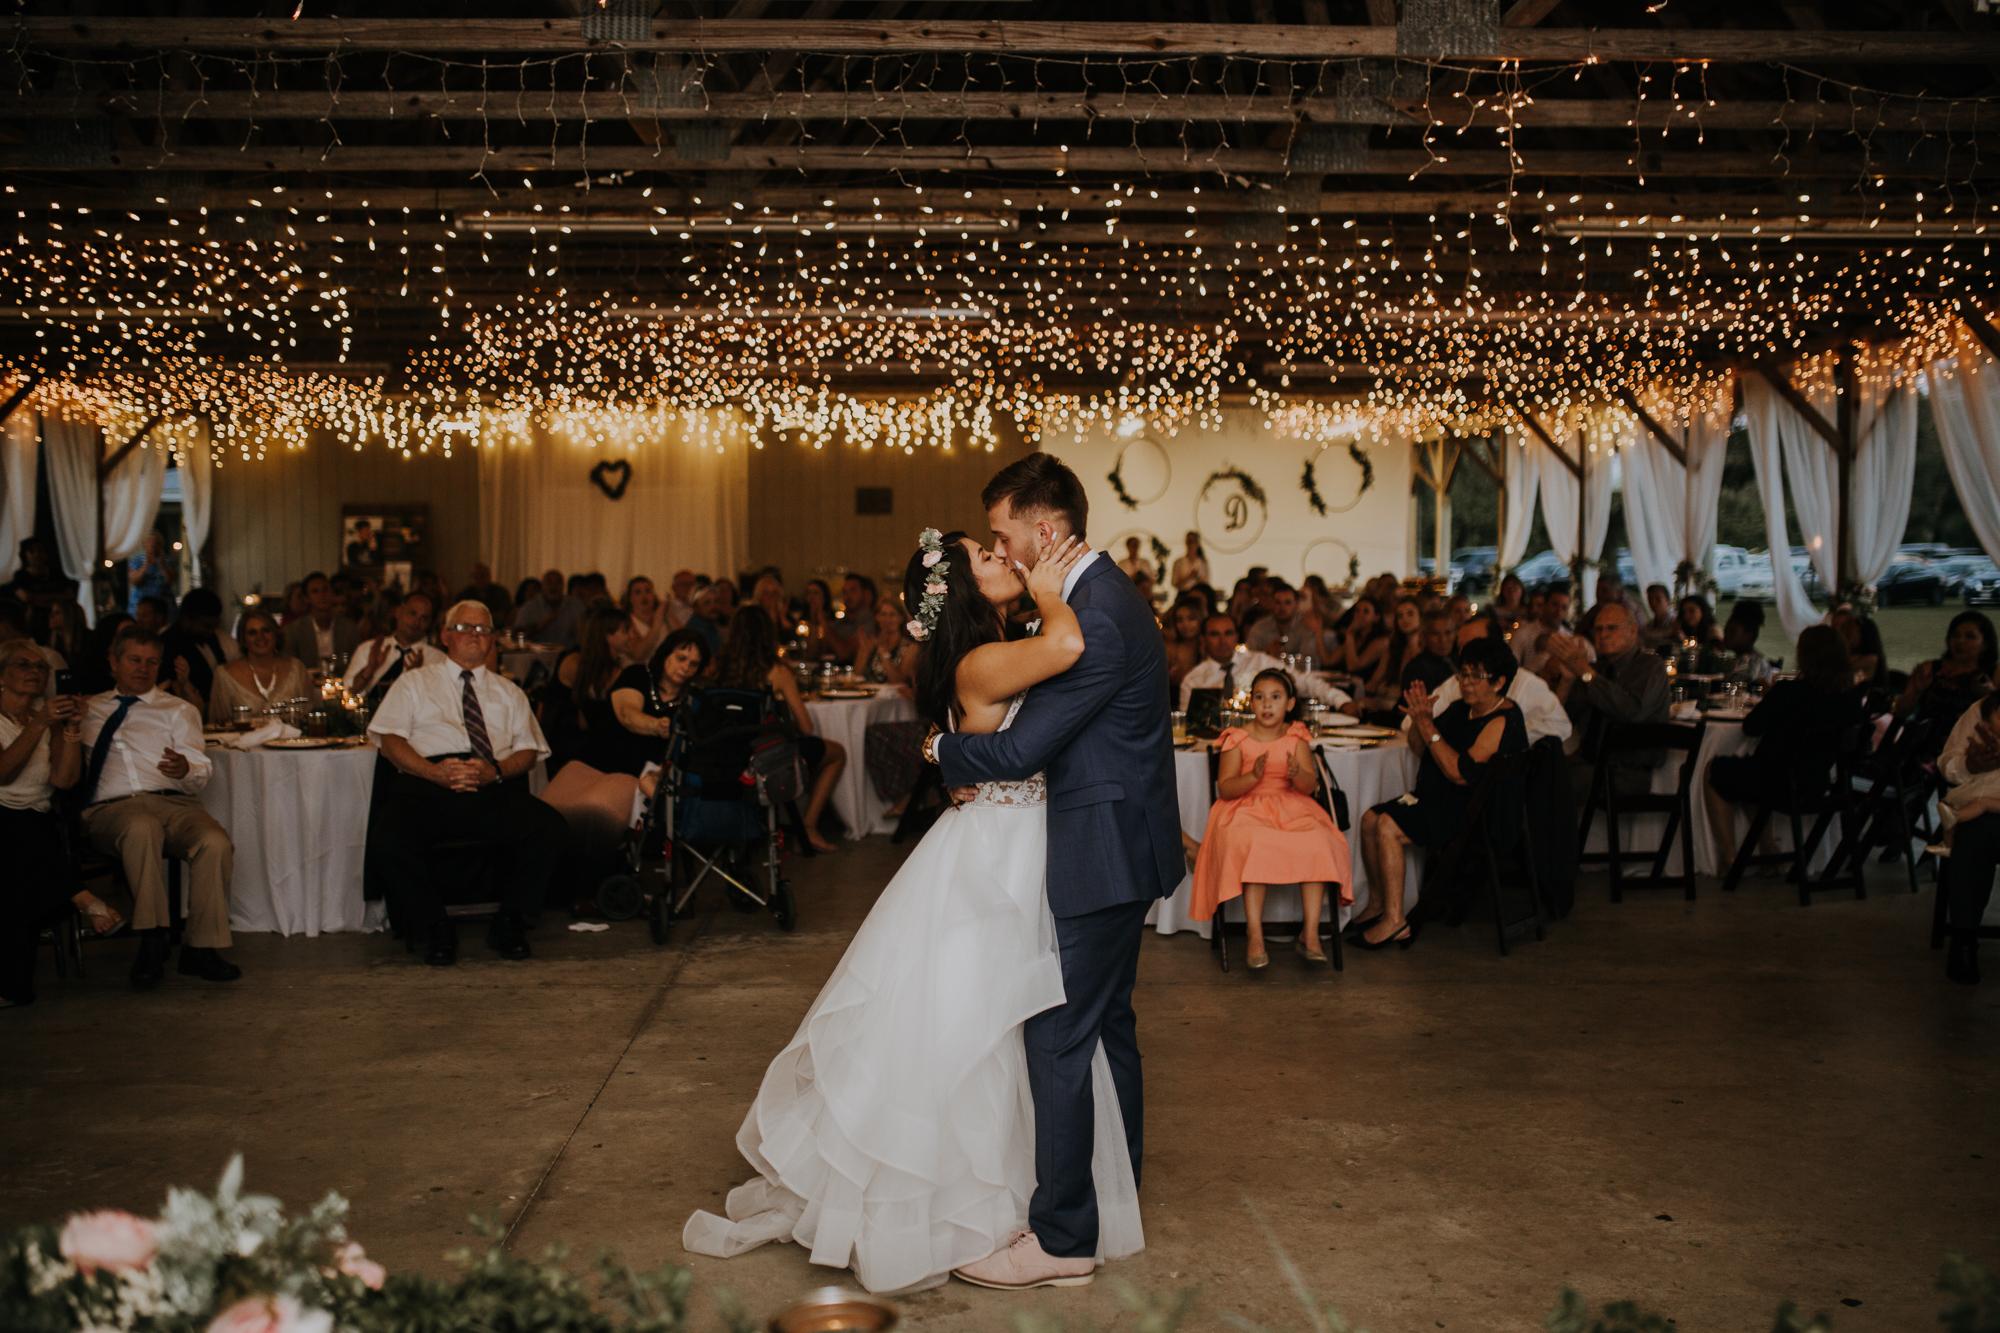 husband and wife first dance | wedding first dance | first dance as husband and wife | boho wedding reception | romantic sarasota wedding | twinkle lights at the reception | first dance under the twinkle lights